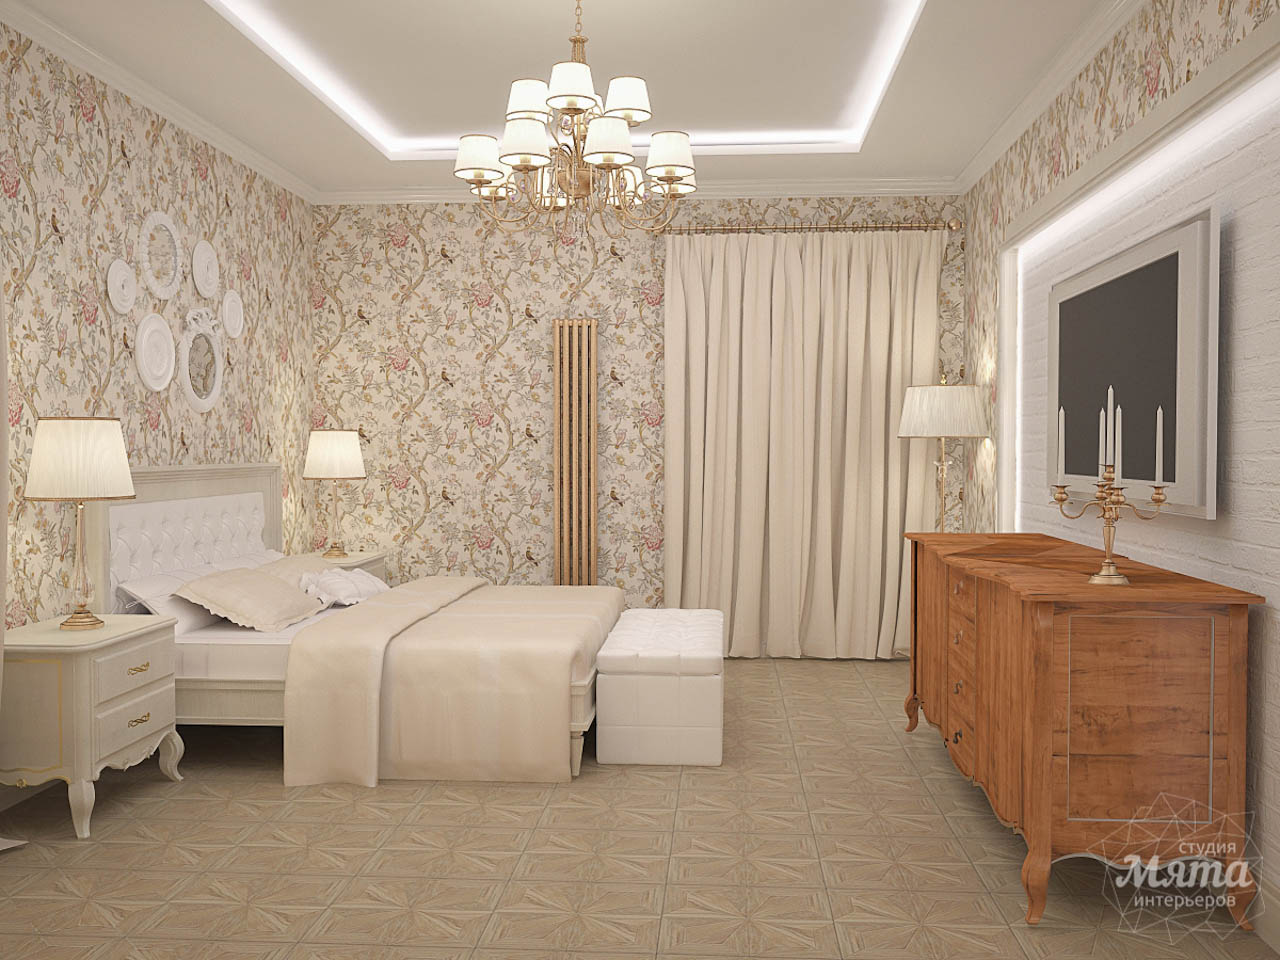 Дизайн интерьера коттеджа по ул. Ландышевая 23 img984002474